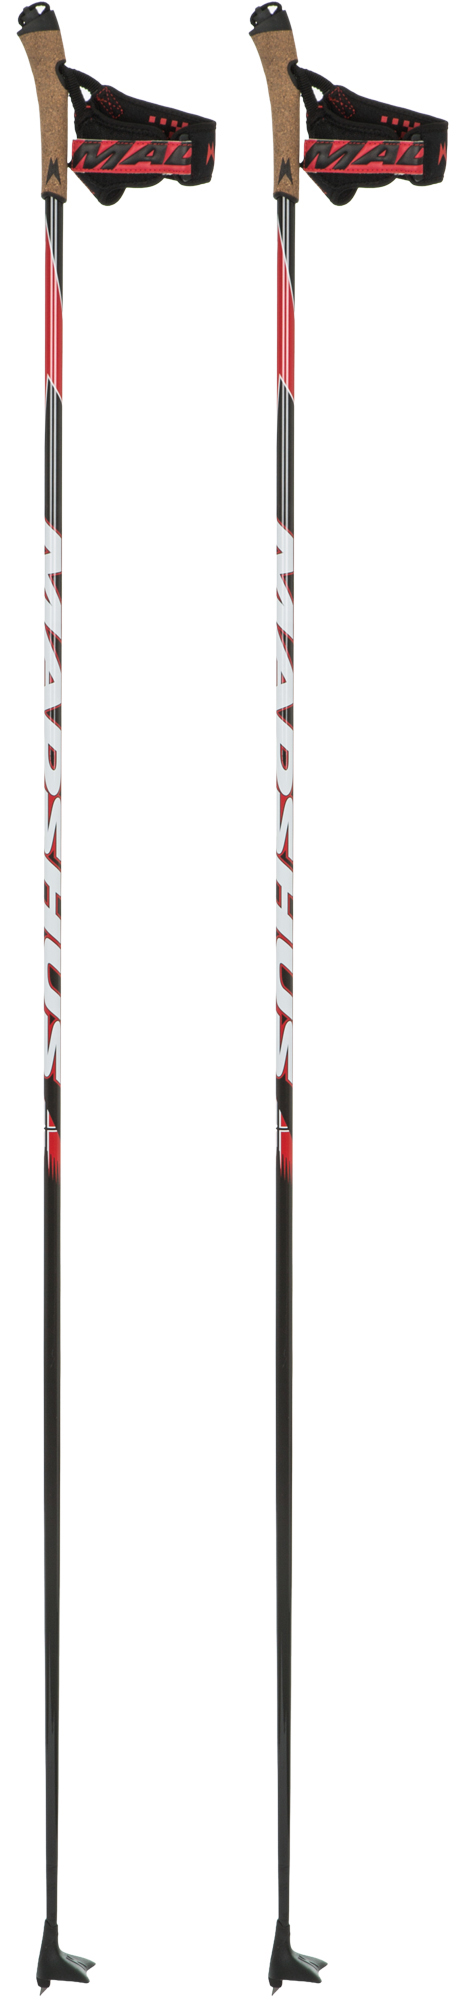 Madshus Палки для беговых лыж CR70